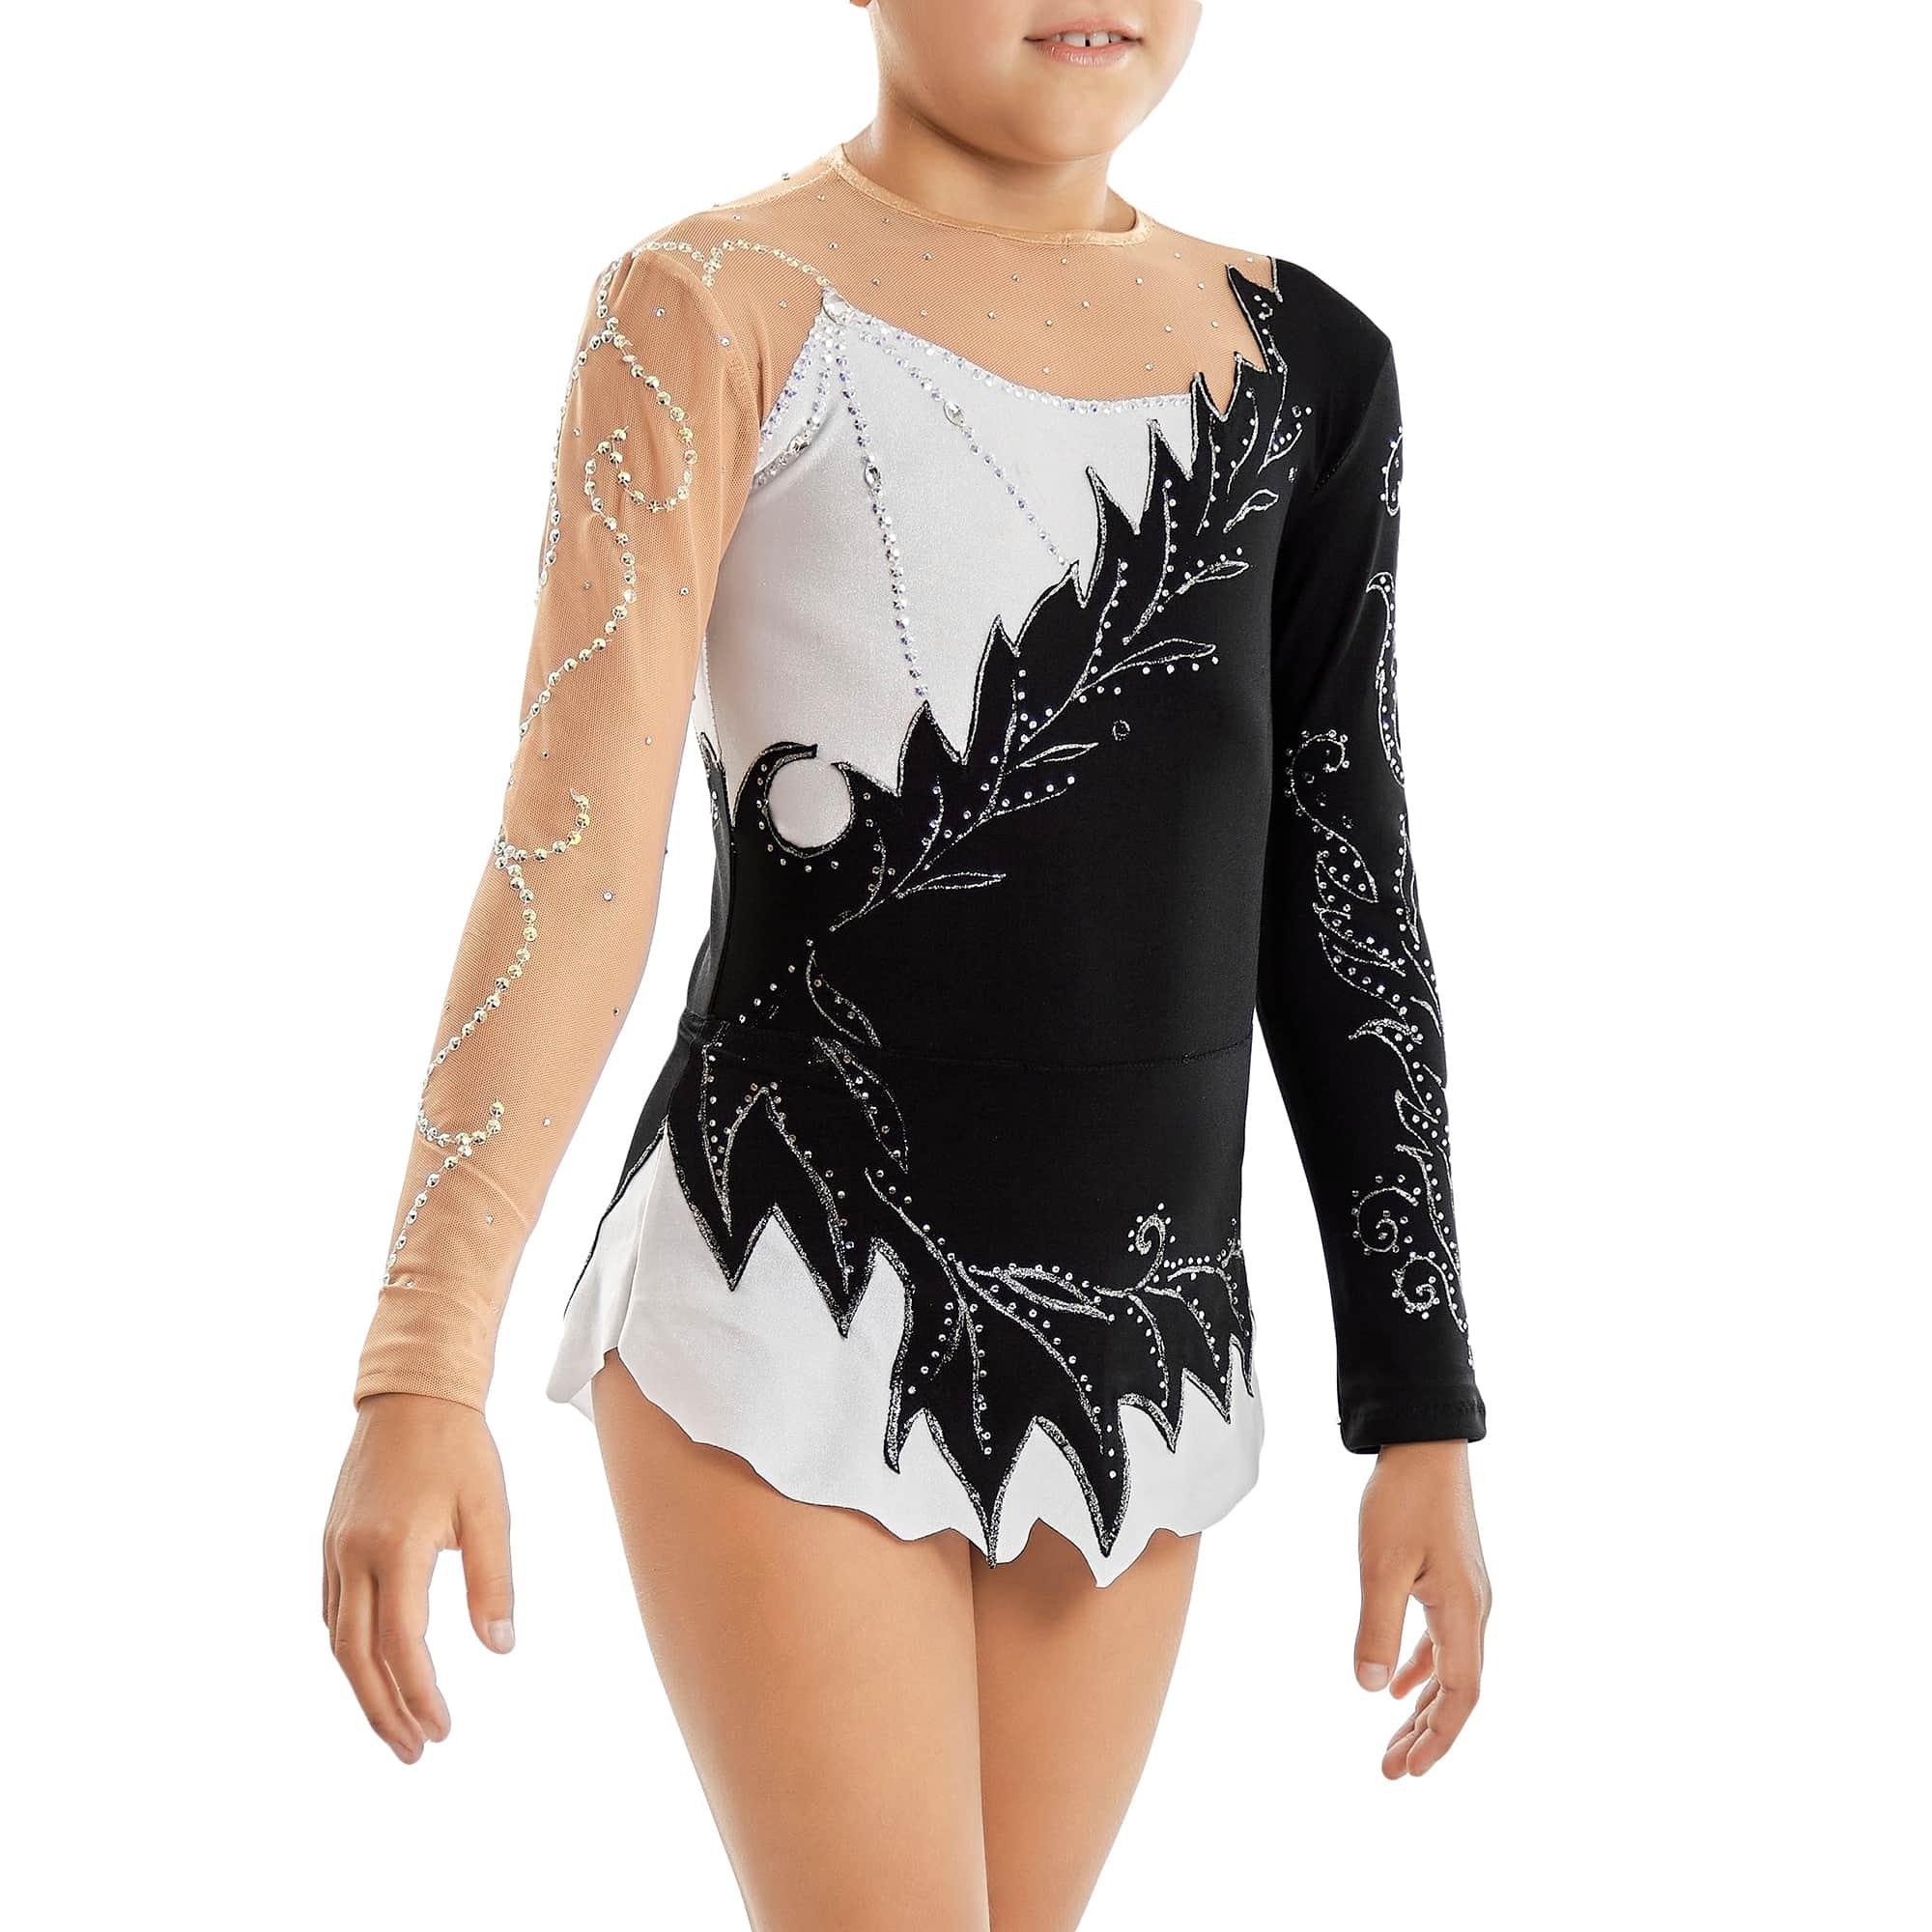 Black & White Ice Figure Skating Dress № 19